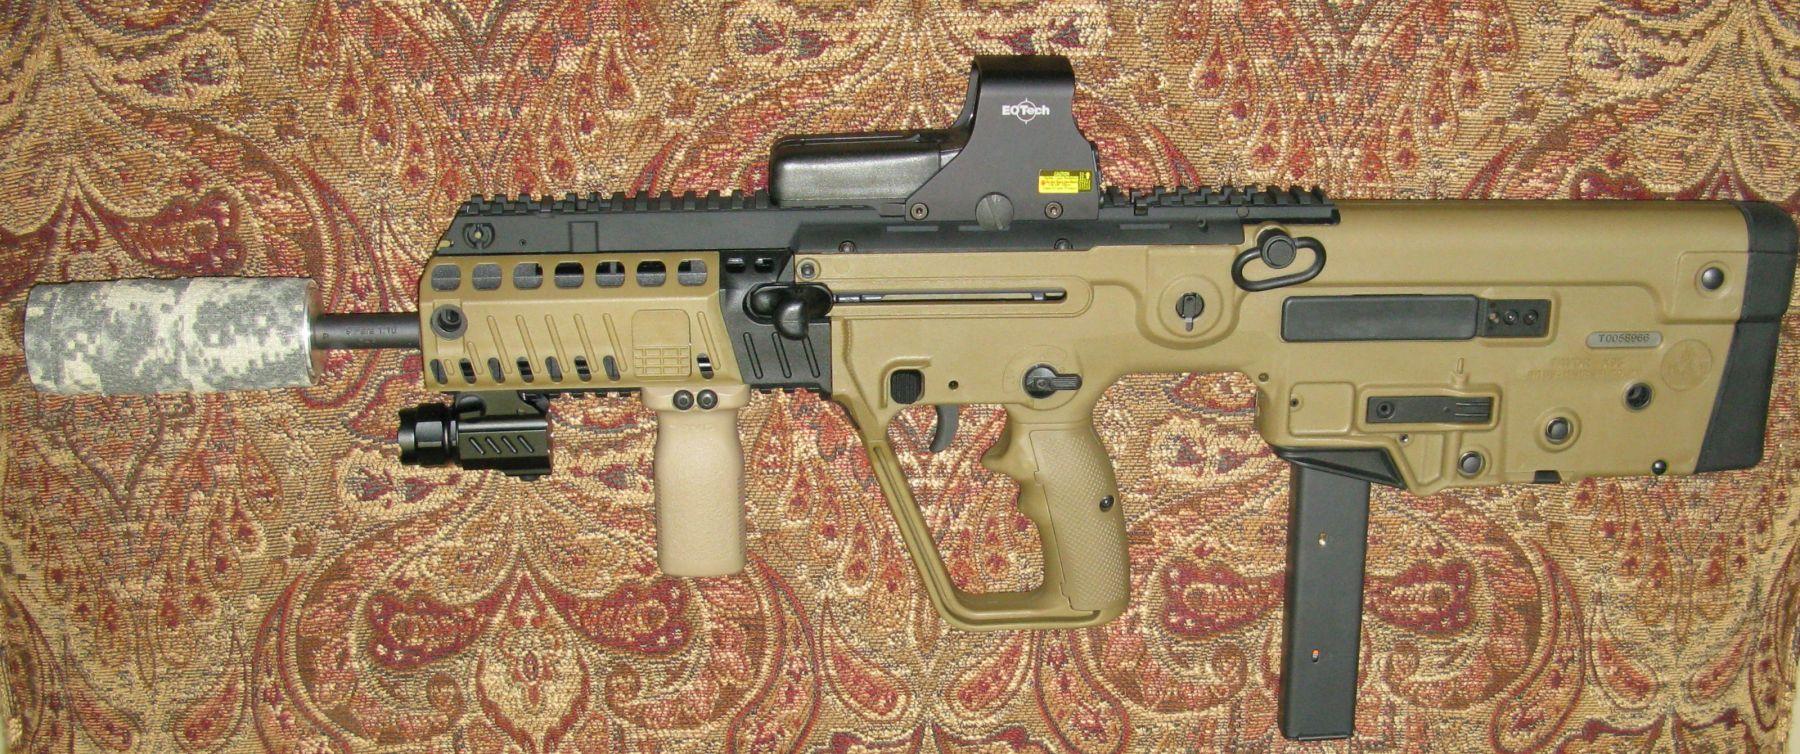 hight resolution of 9mm tavor x95 with suppressor